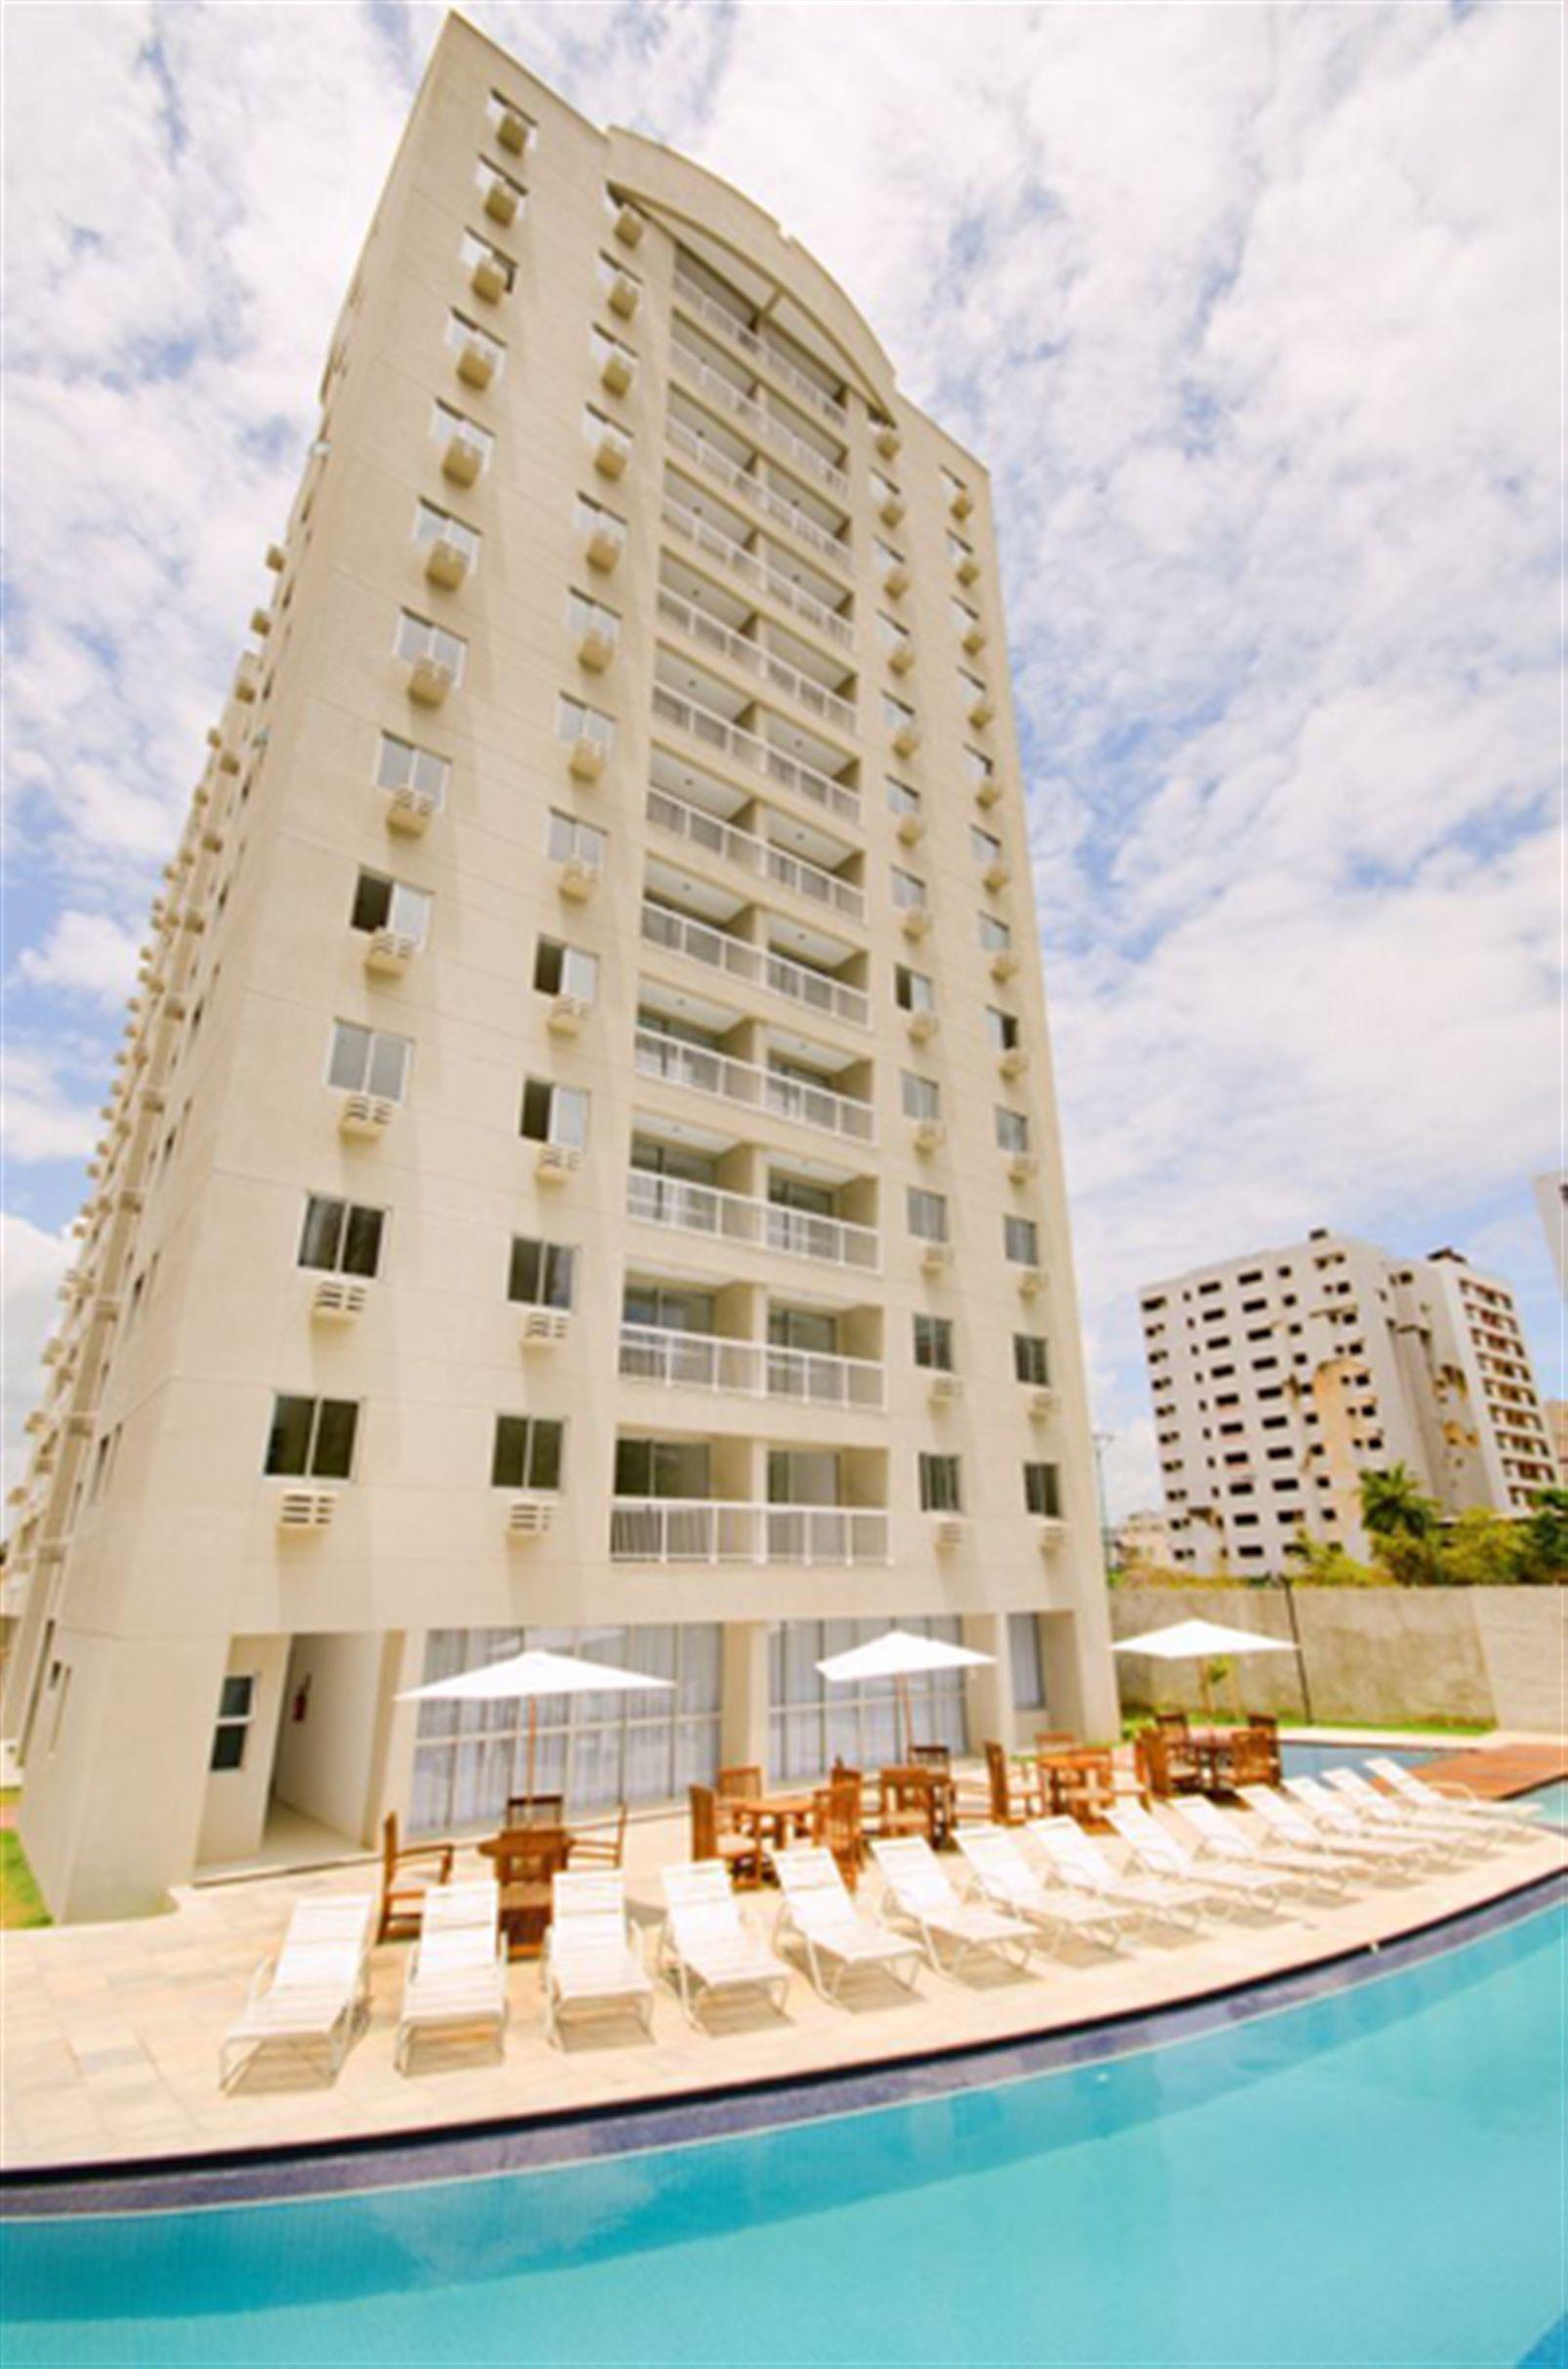 Imóvel pronto | Vita Praia - Recife – Apartamentoem  Piedade - Recife - Pernambuco